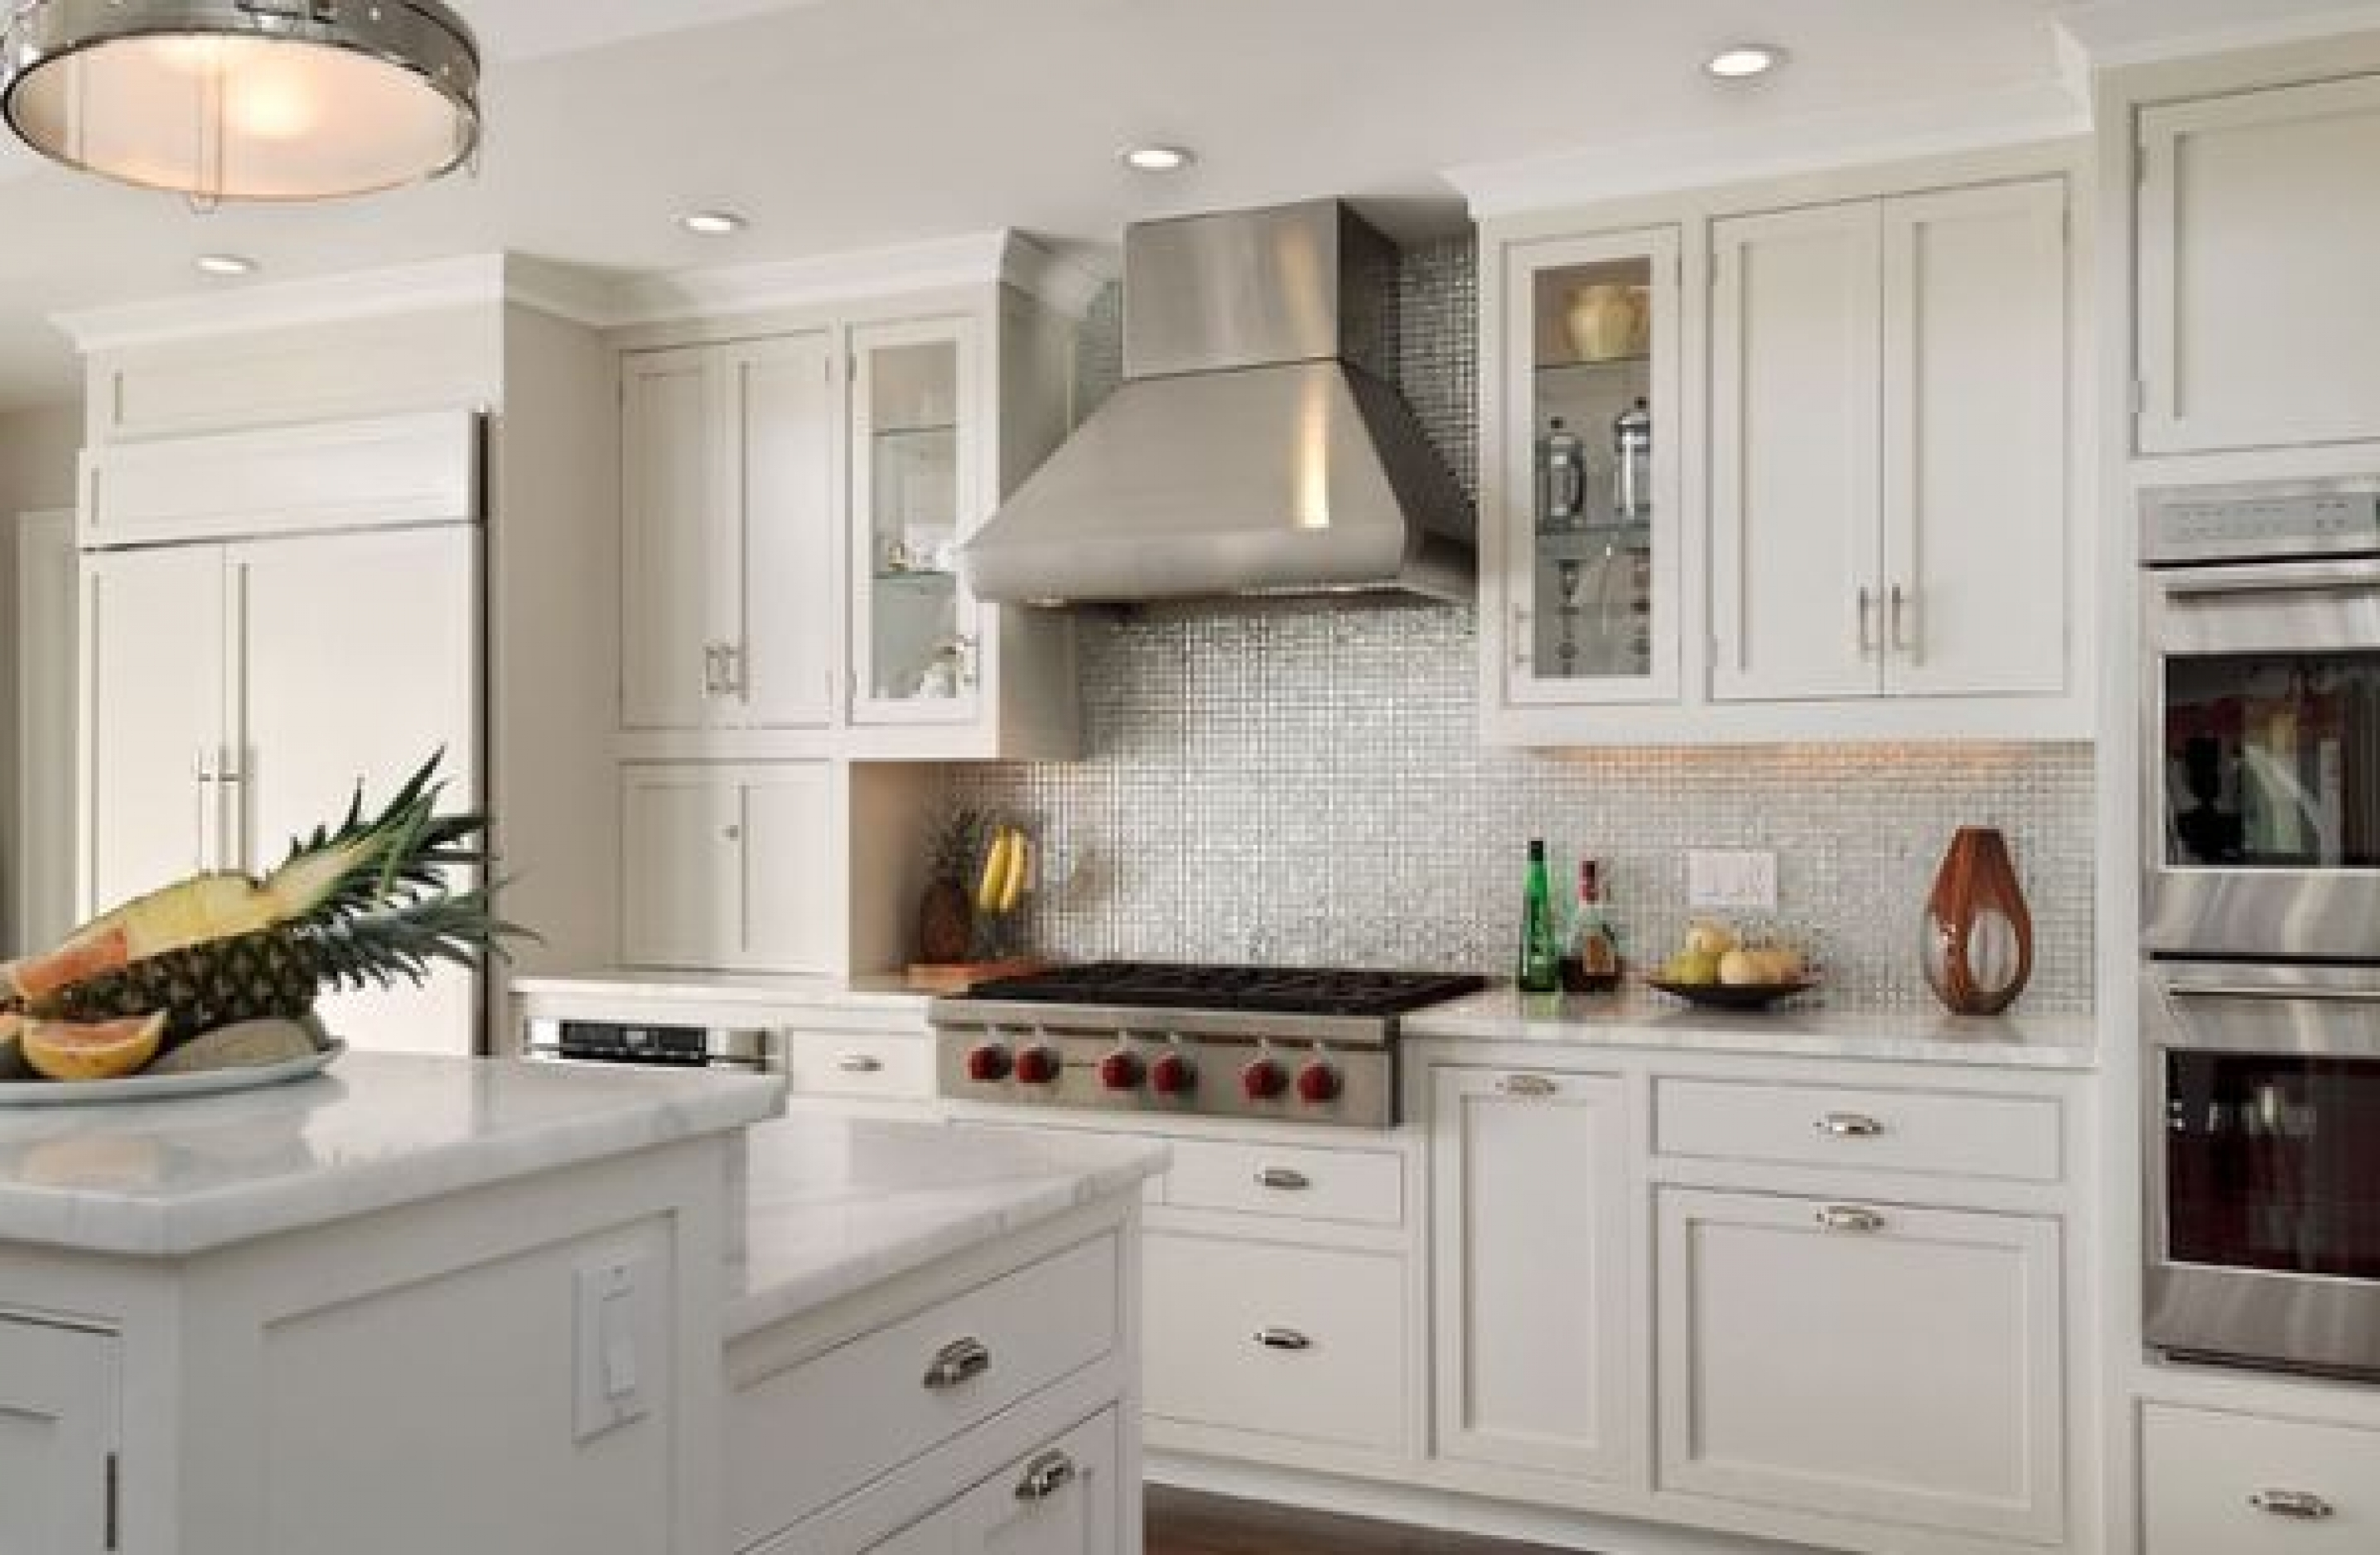 beautiful kitchen backsplash ideas with white cabinets about designs WWDDYQG